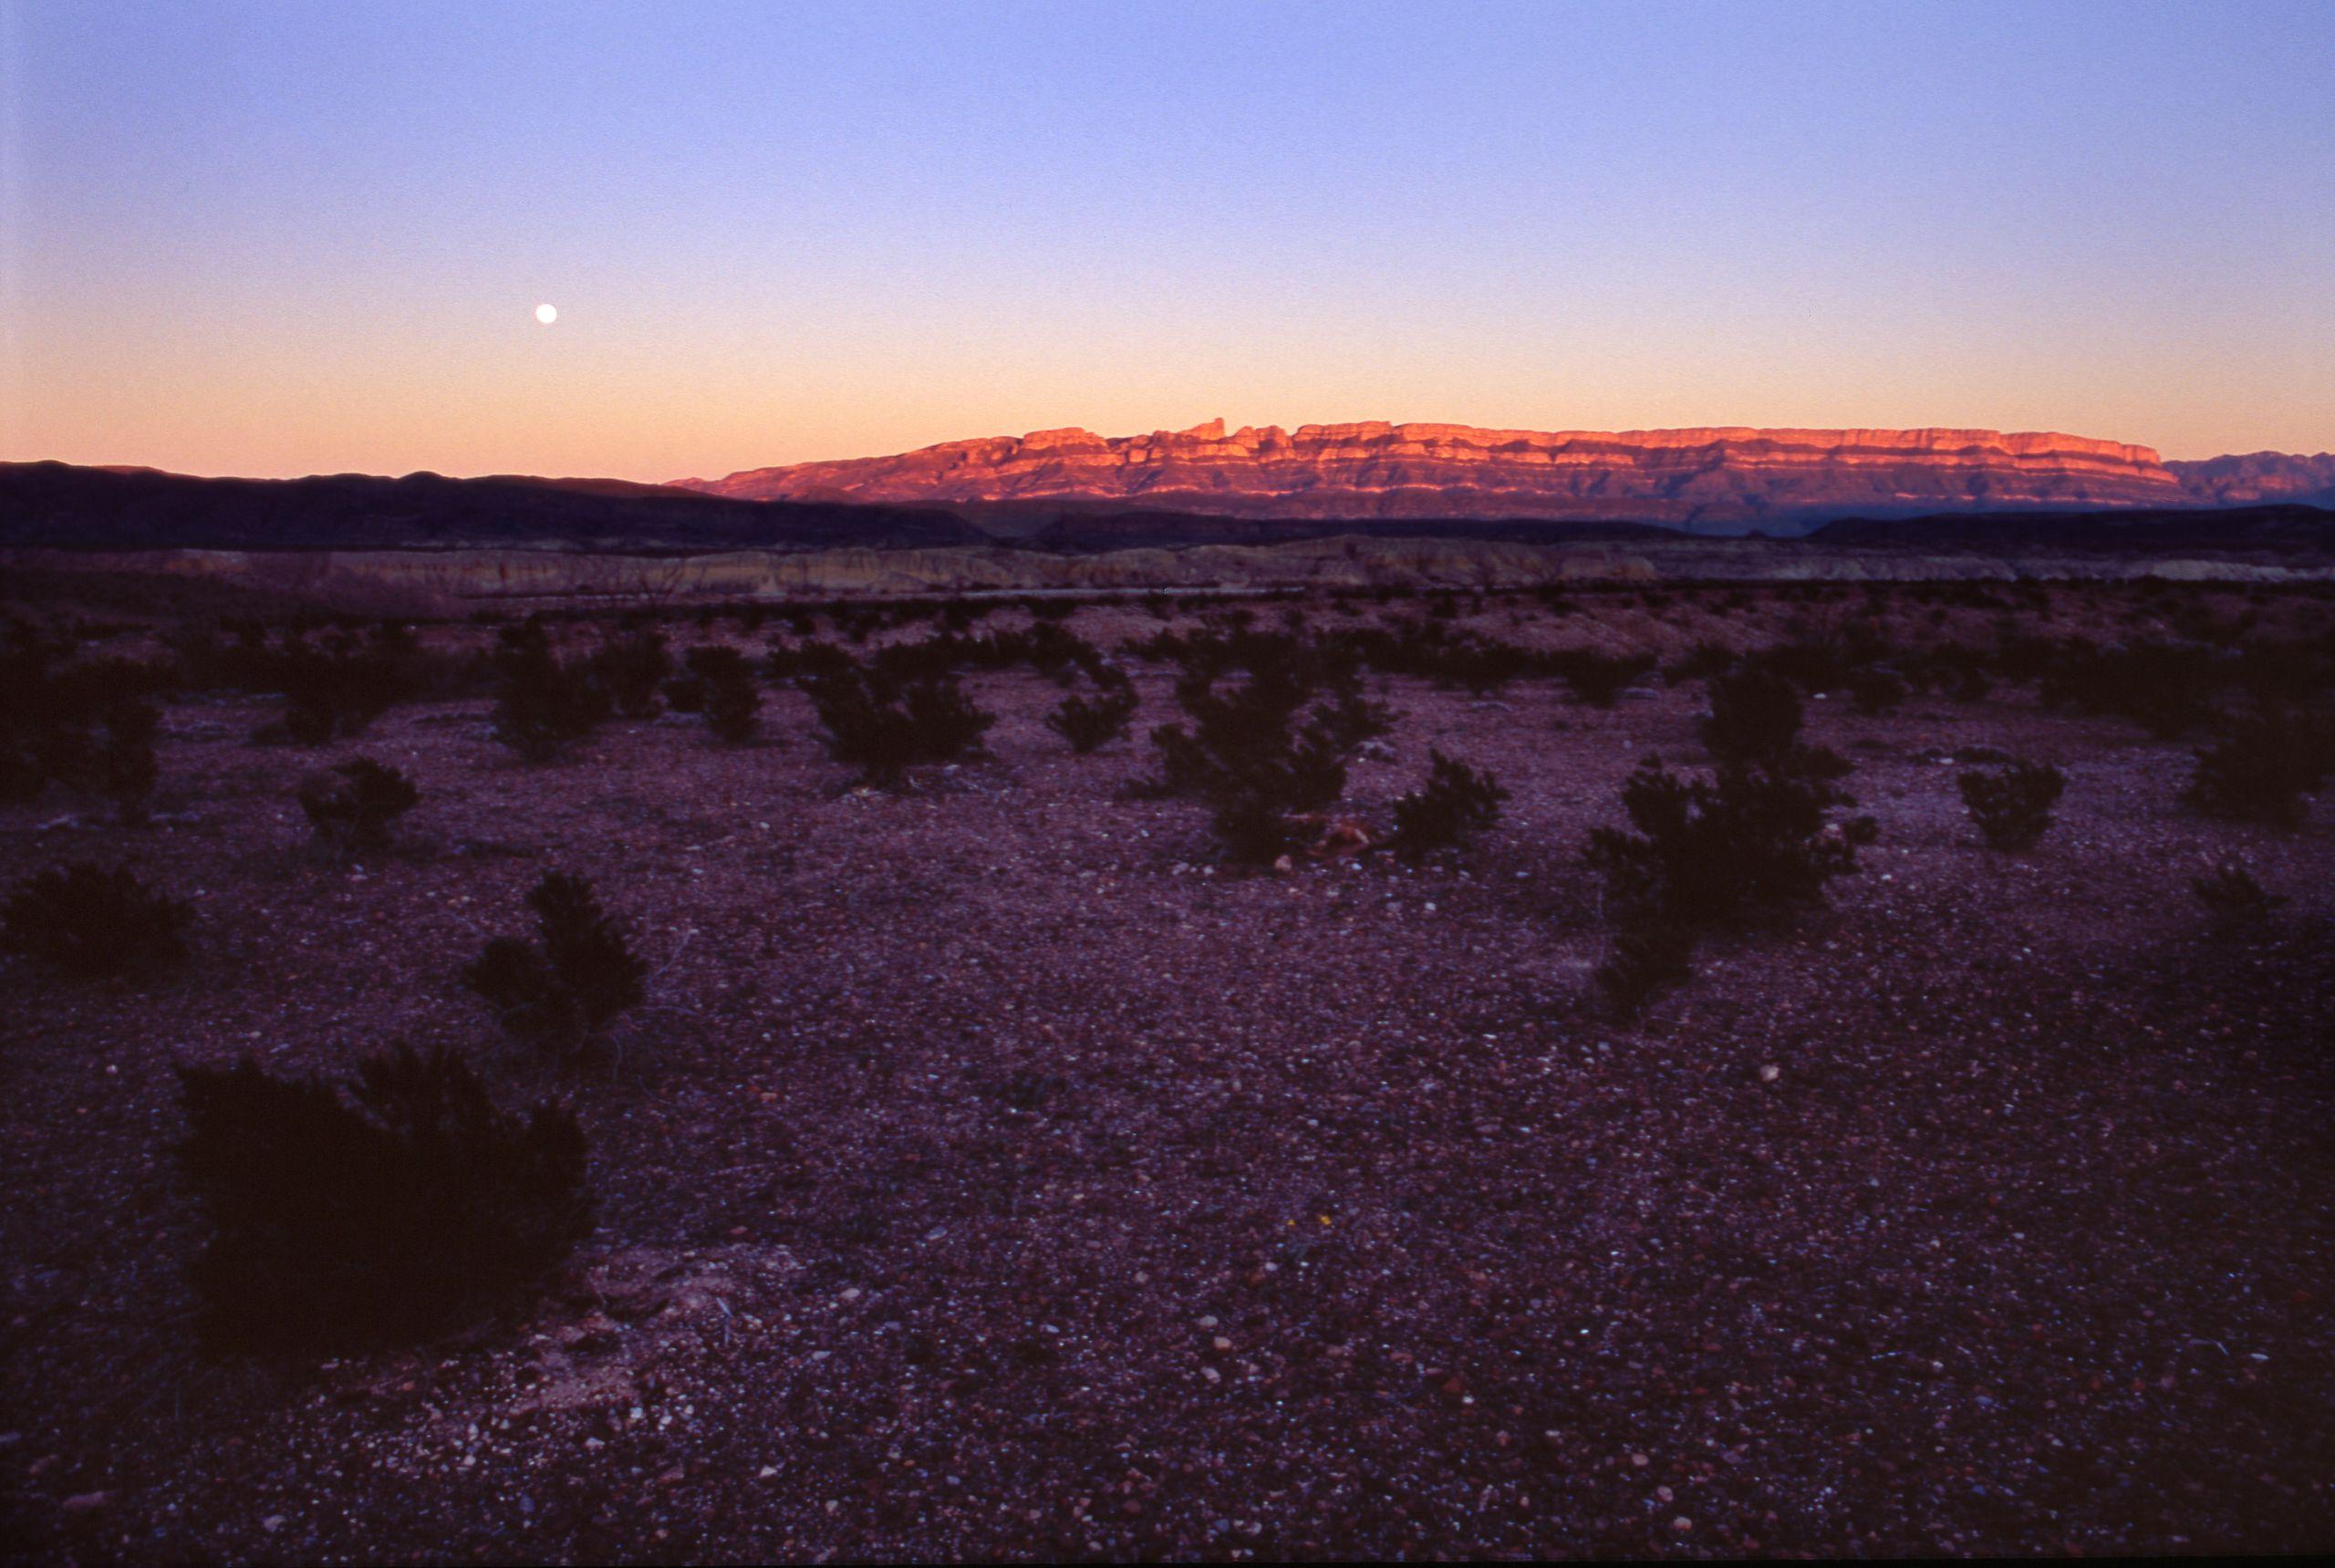 Mesa at Sunset With Moon